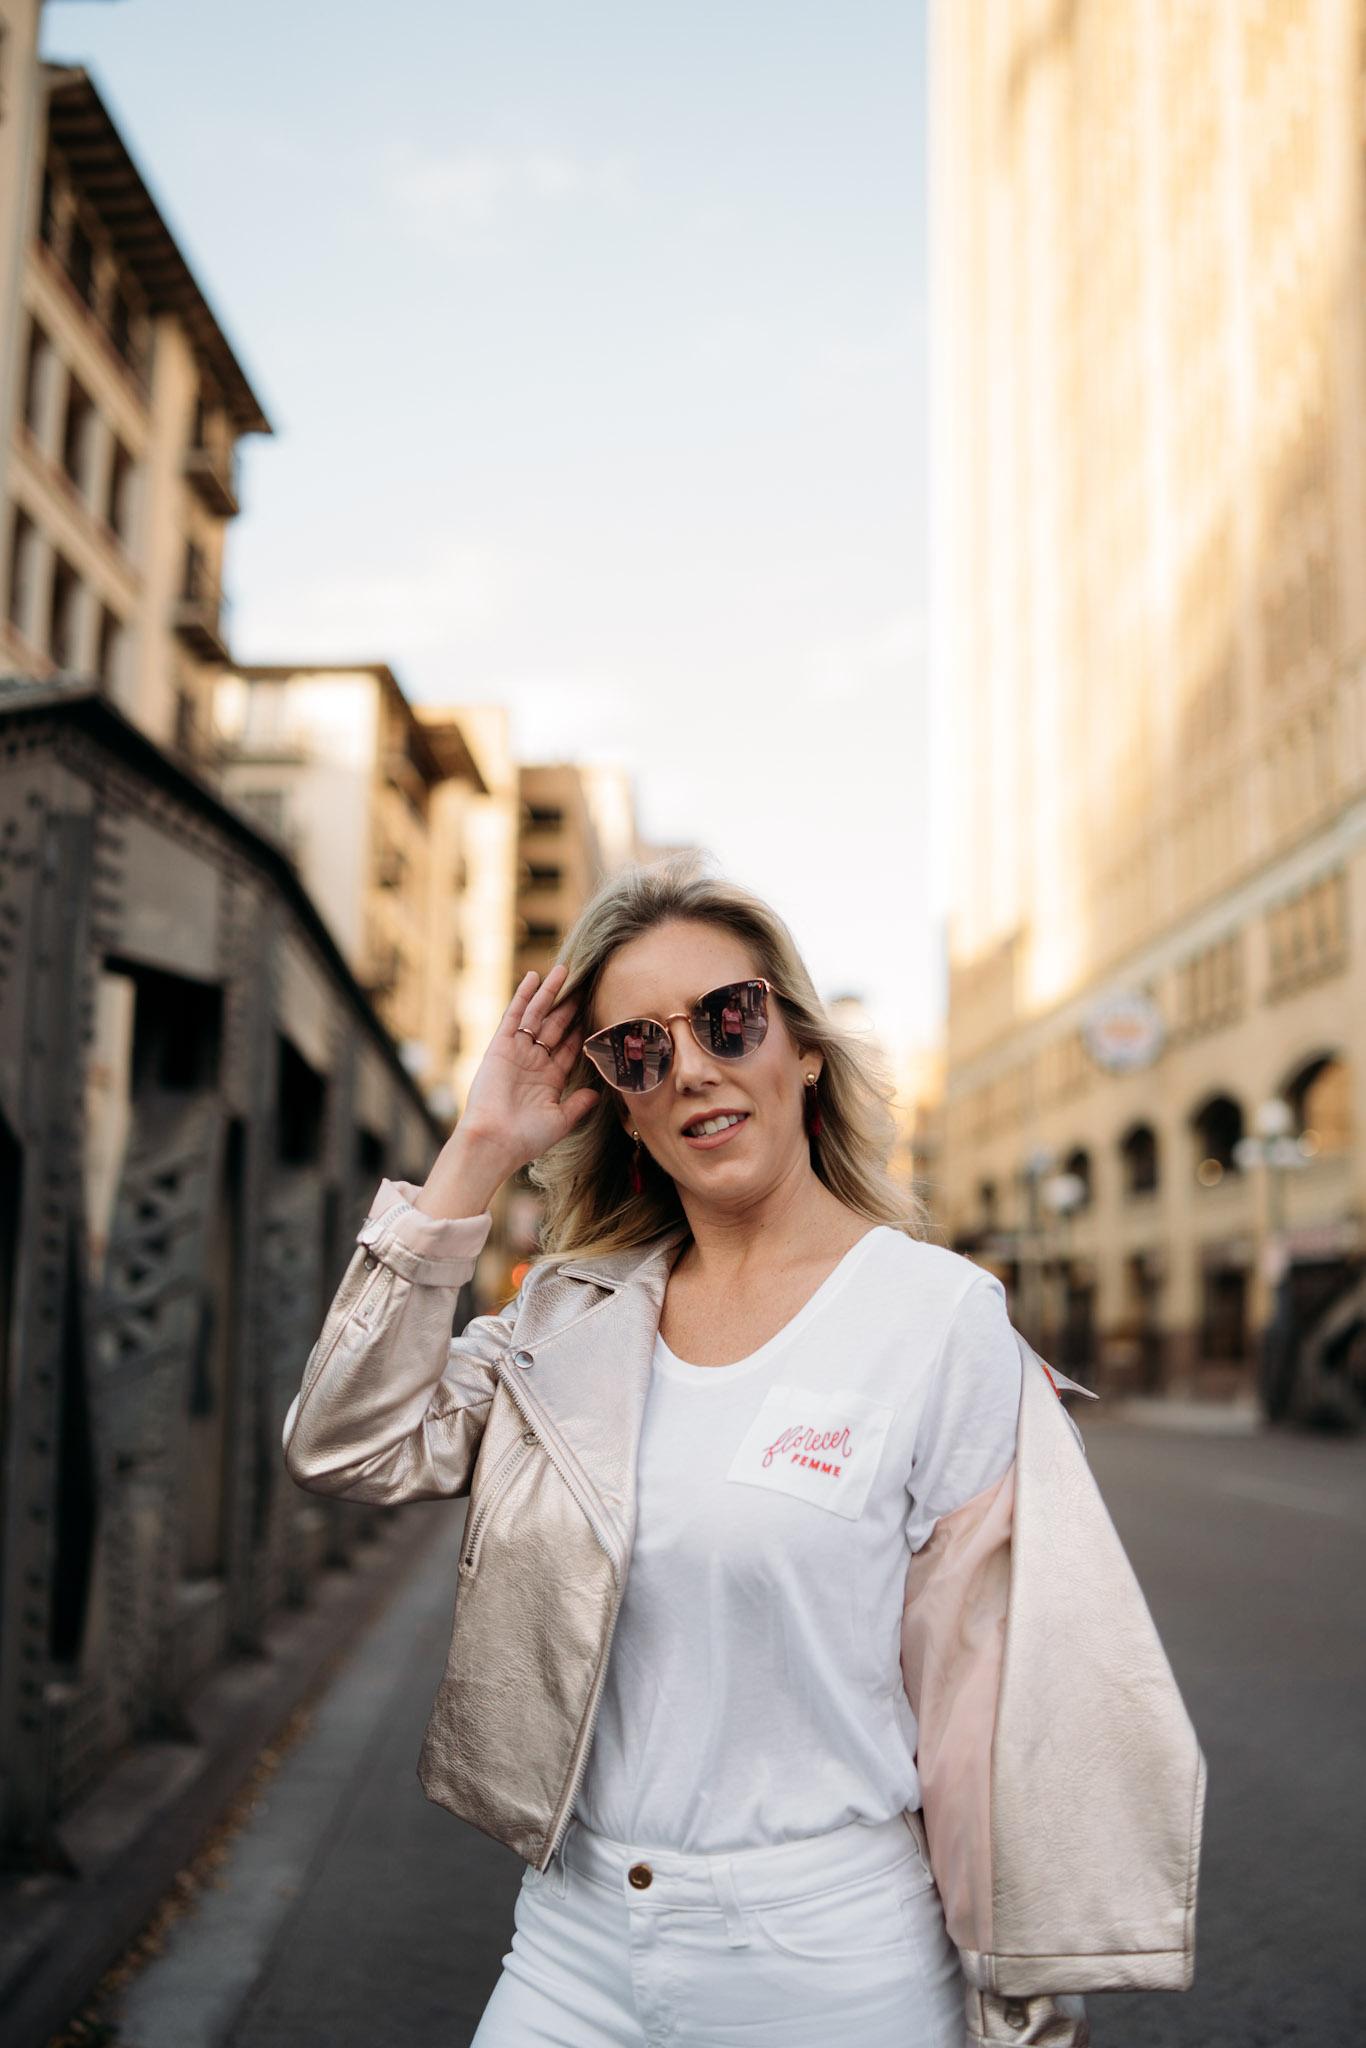 20181104-FlorecerFemme-AdrianGarcia-FOMASCine_BR39119.jpg